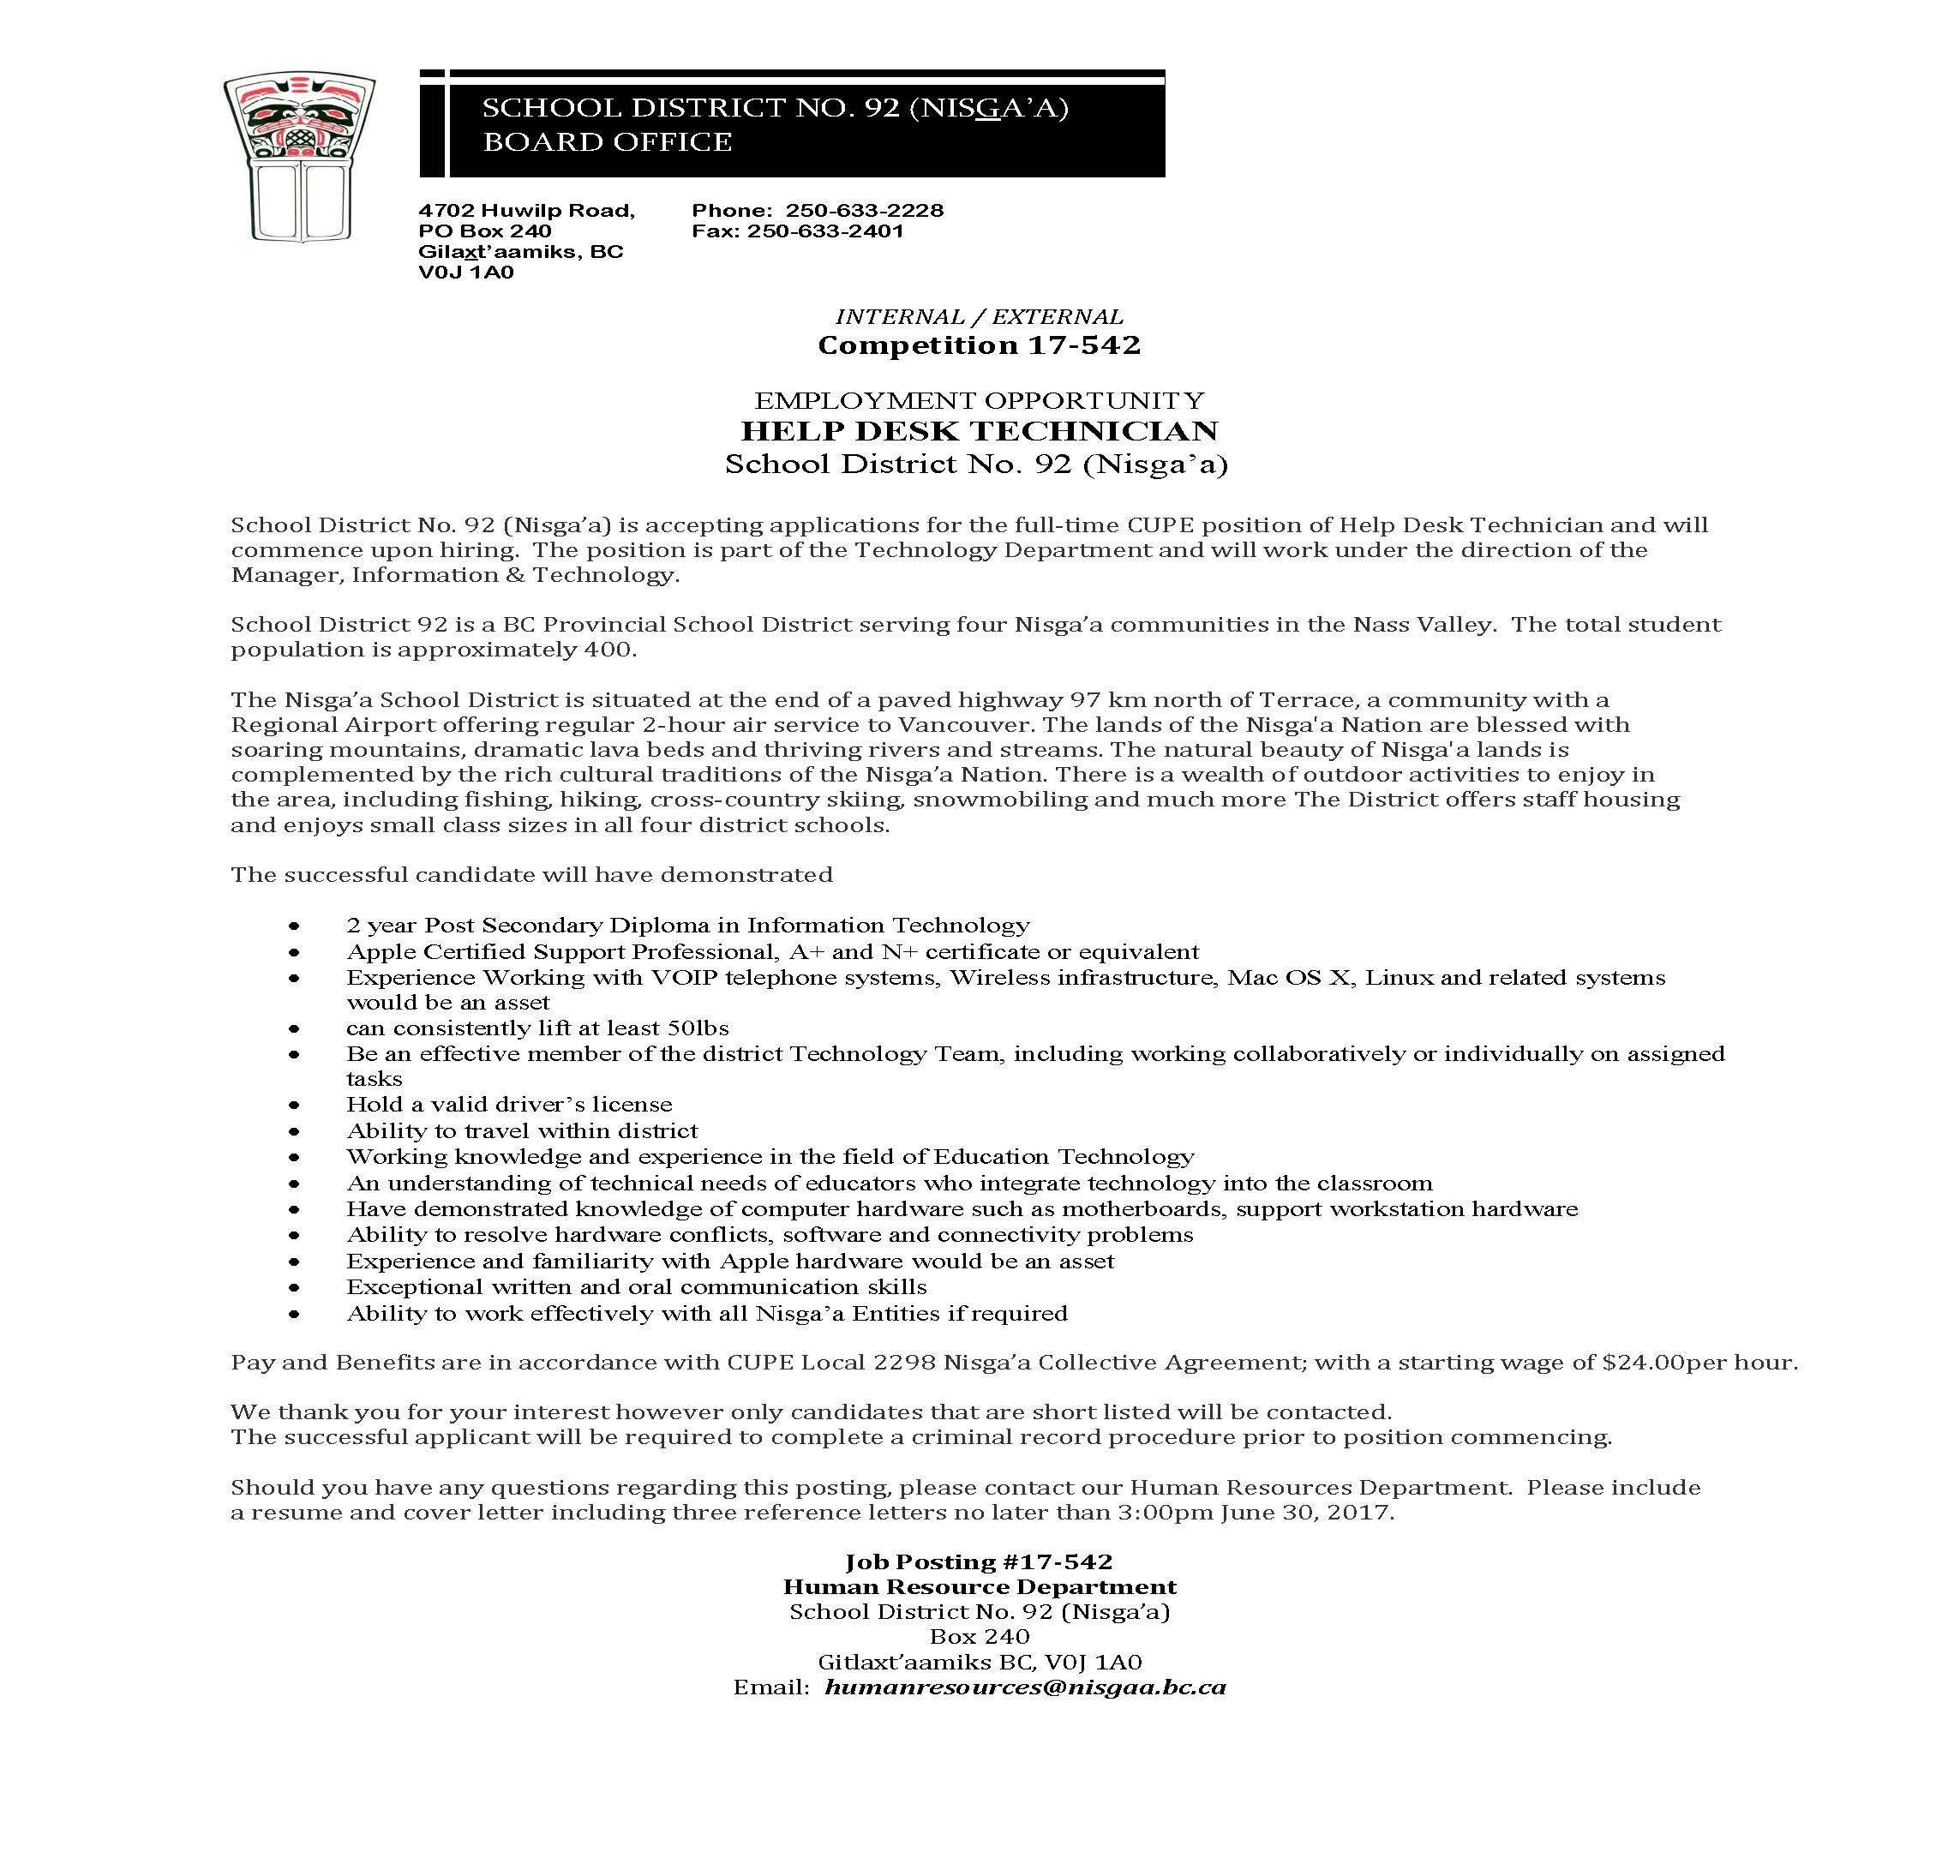 Help desk support technician cover letter